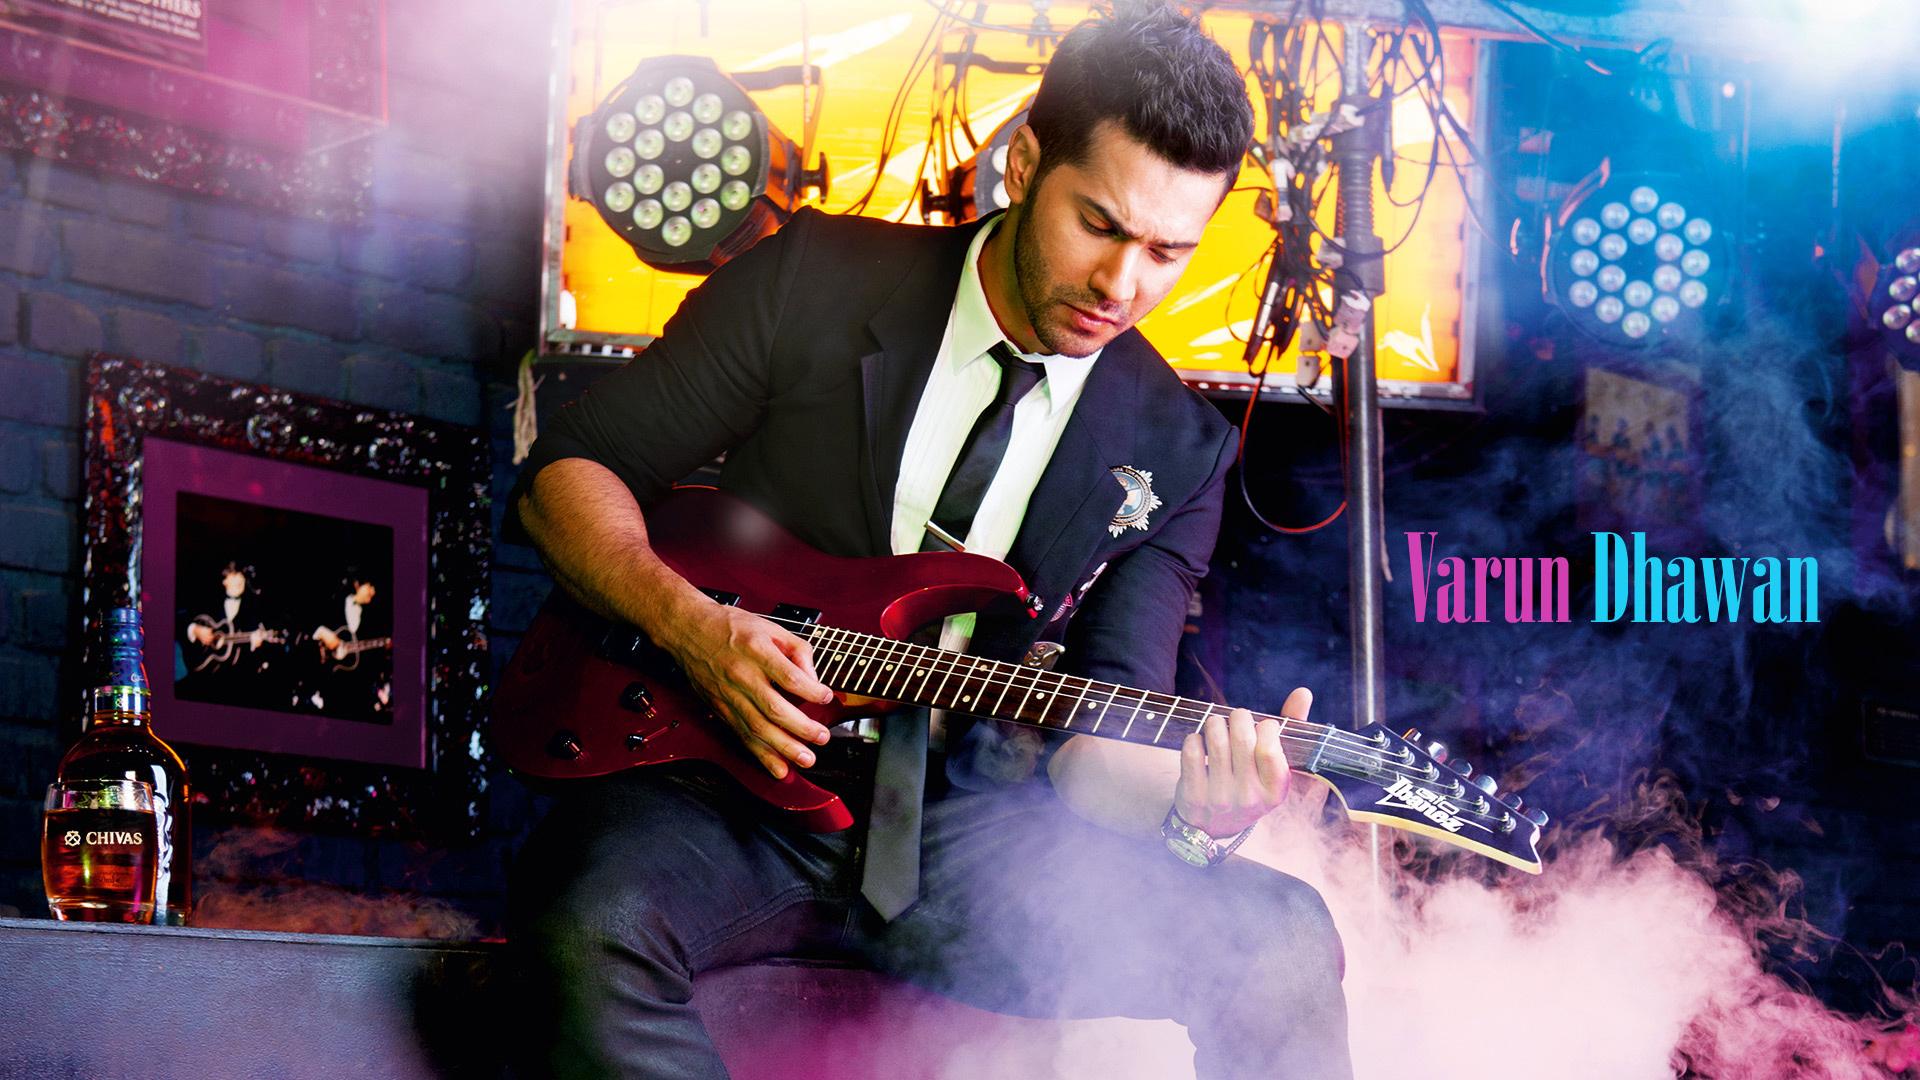 Latest Photos of Varun Dhawan